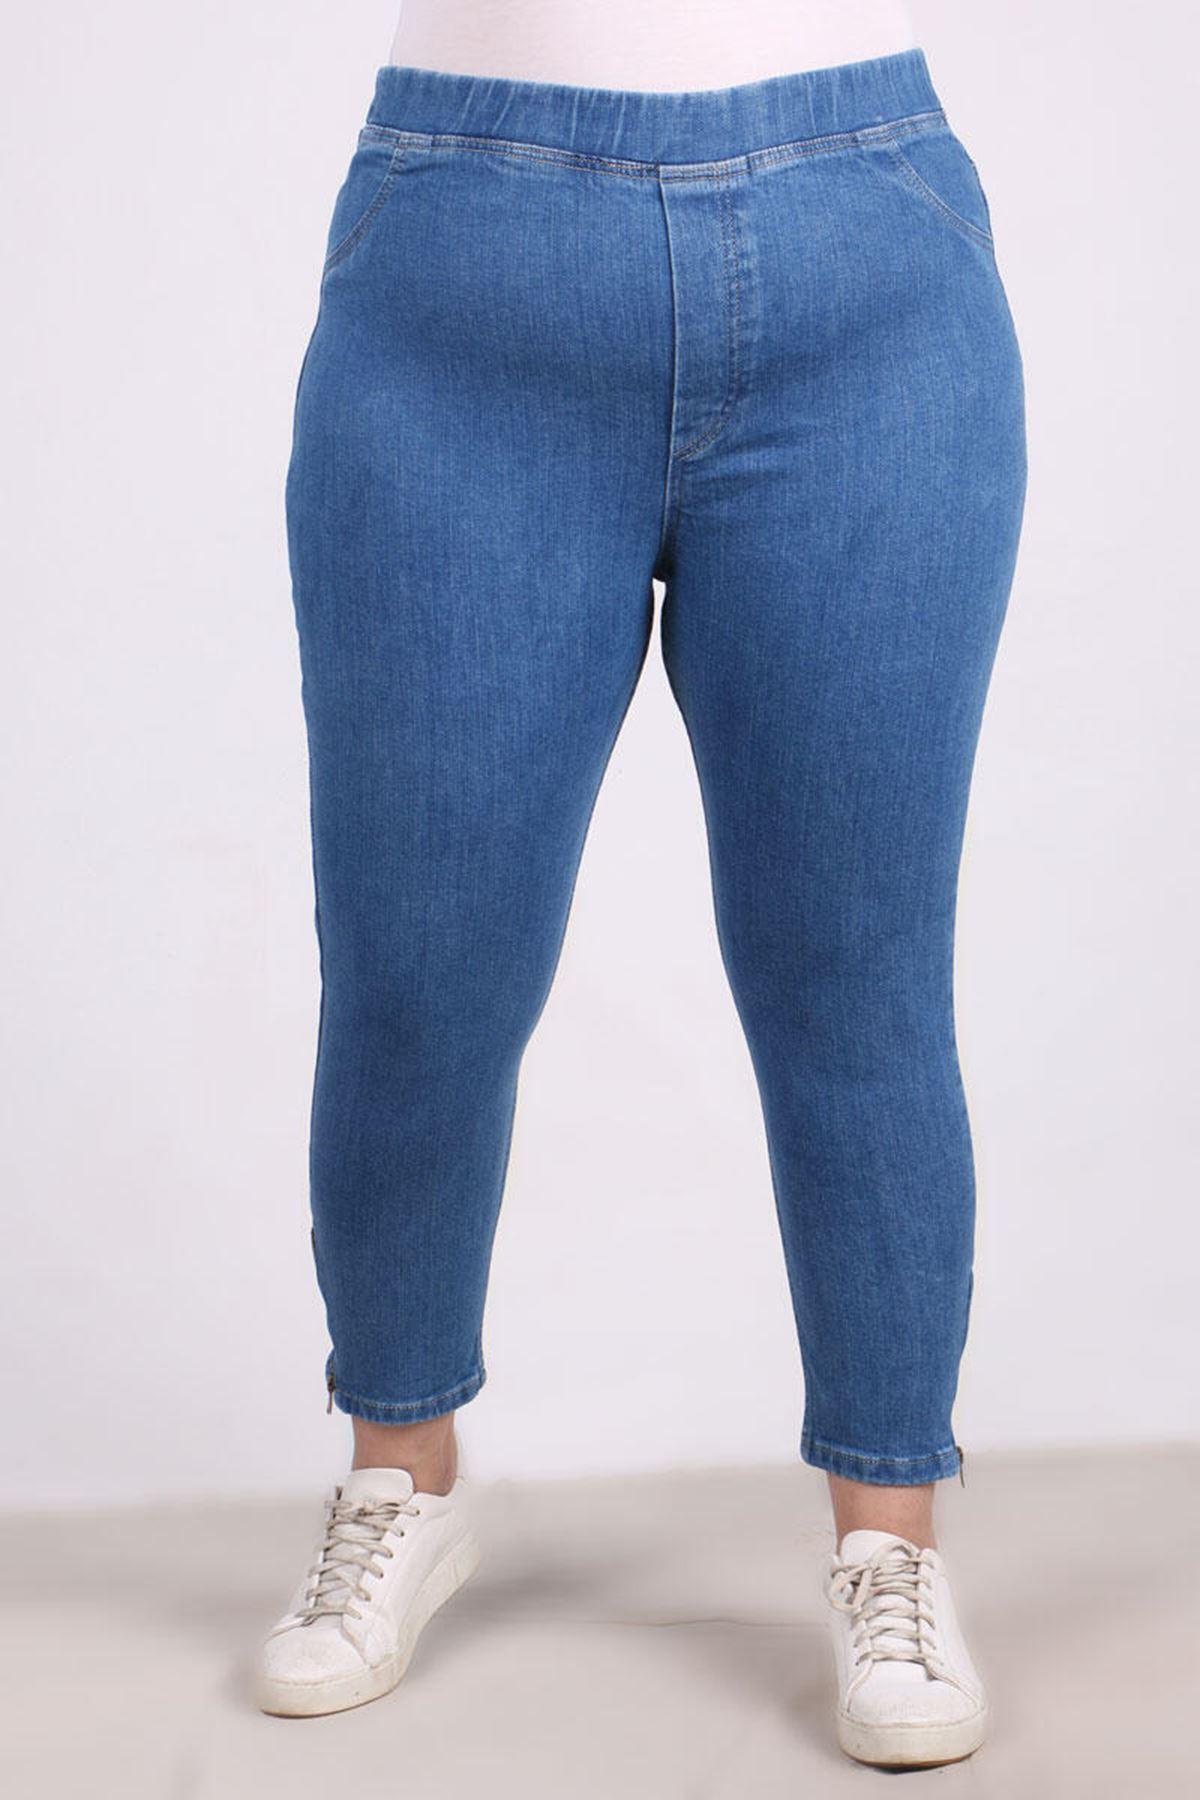 9121 Büyük Beden Fermuar Detaylı Dar Paça Kot Pantalon-Mavi